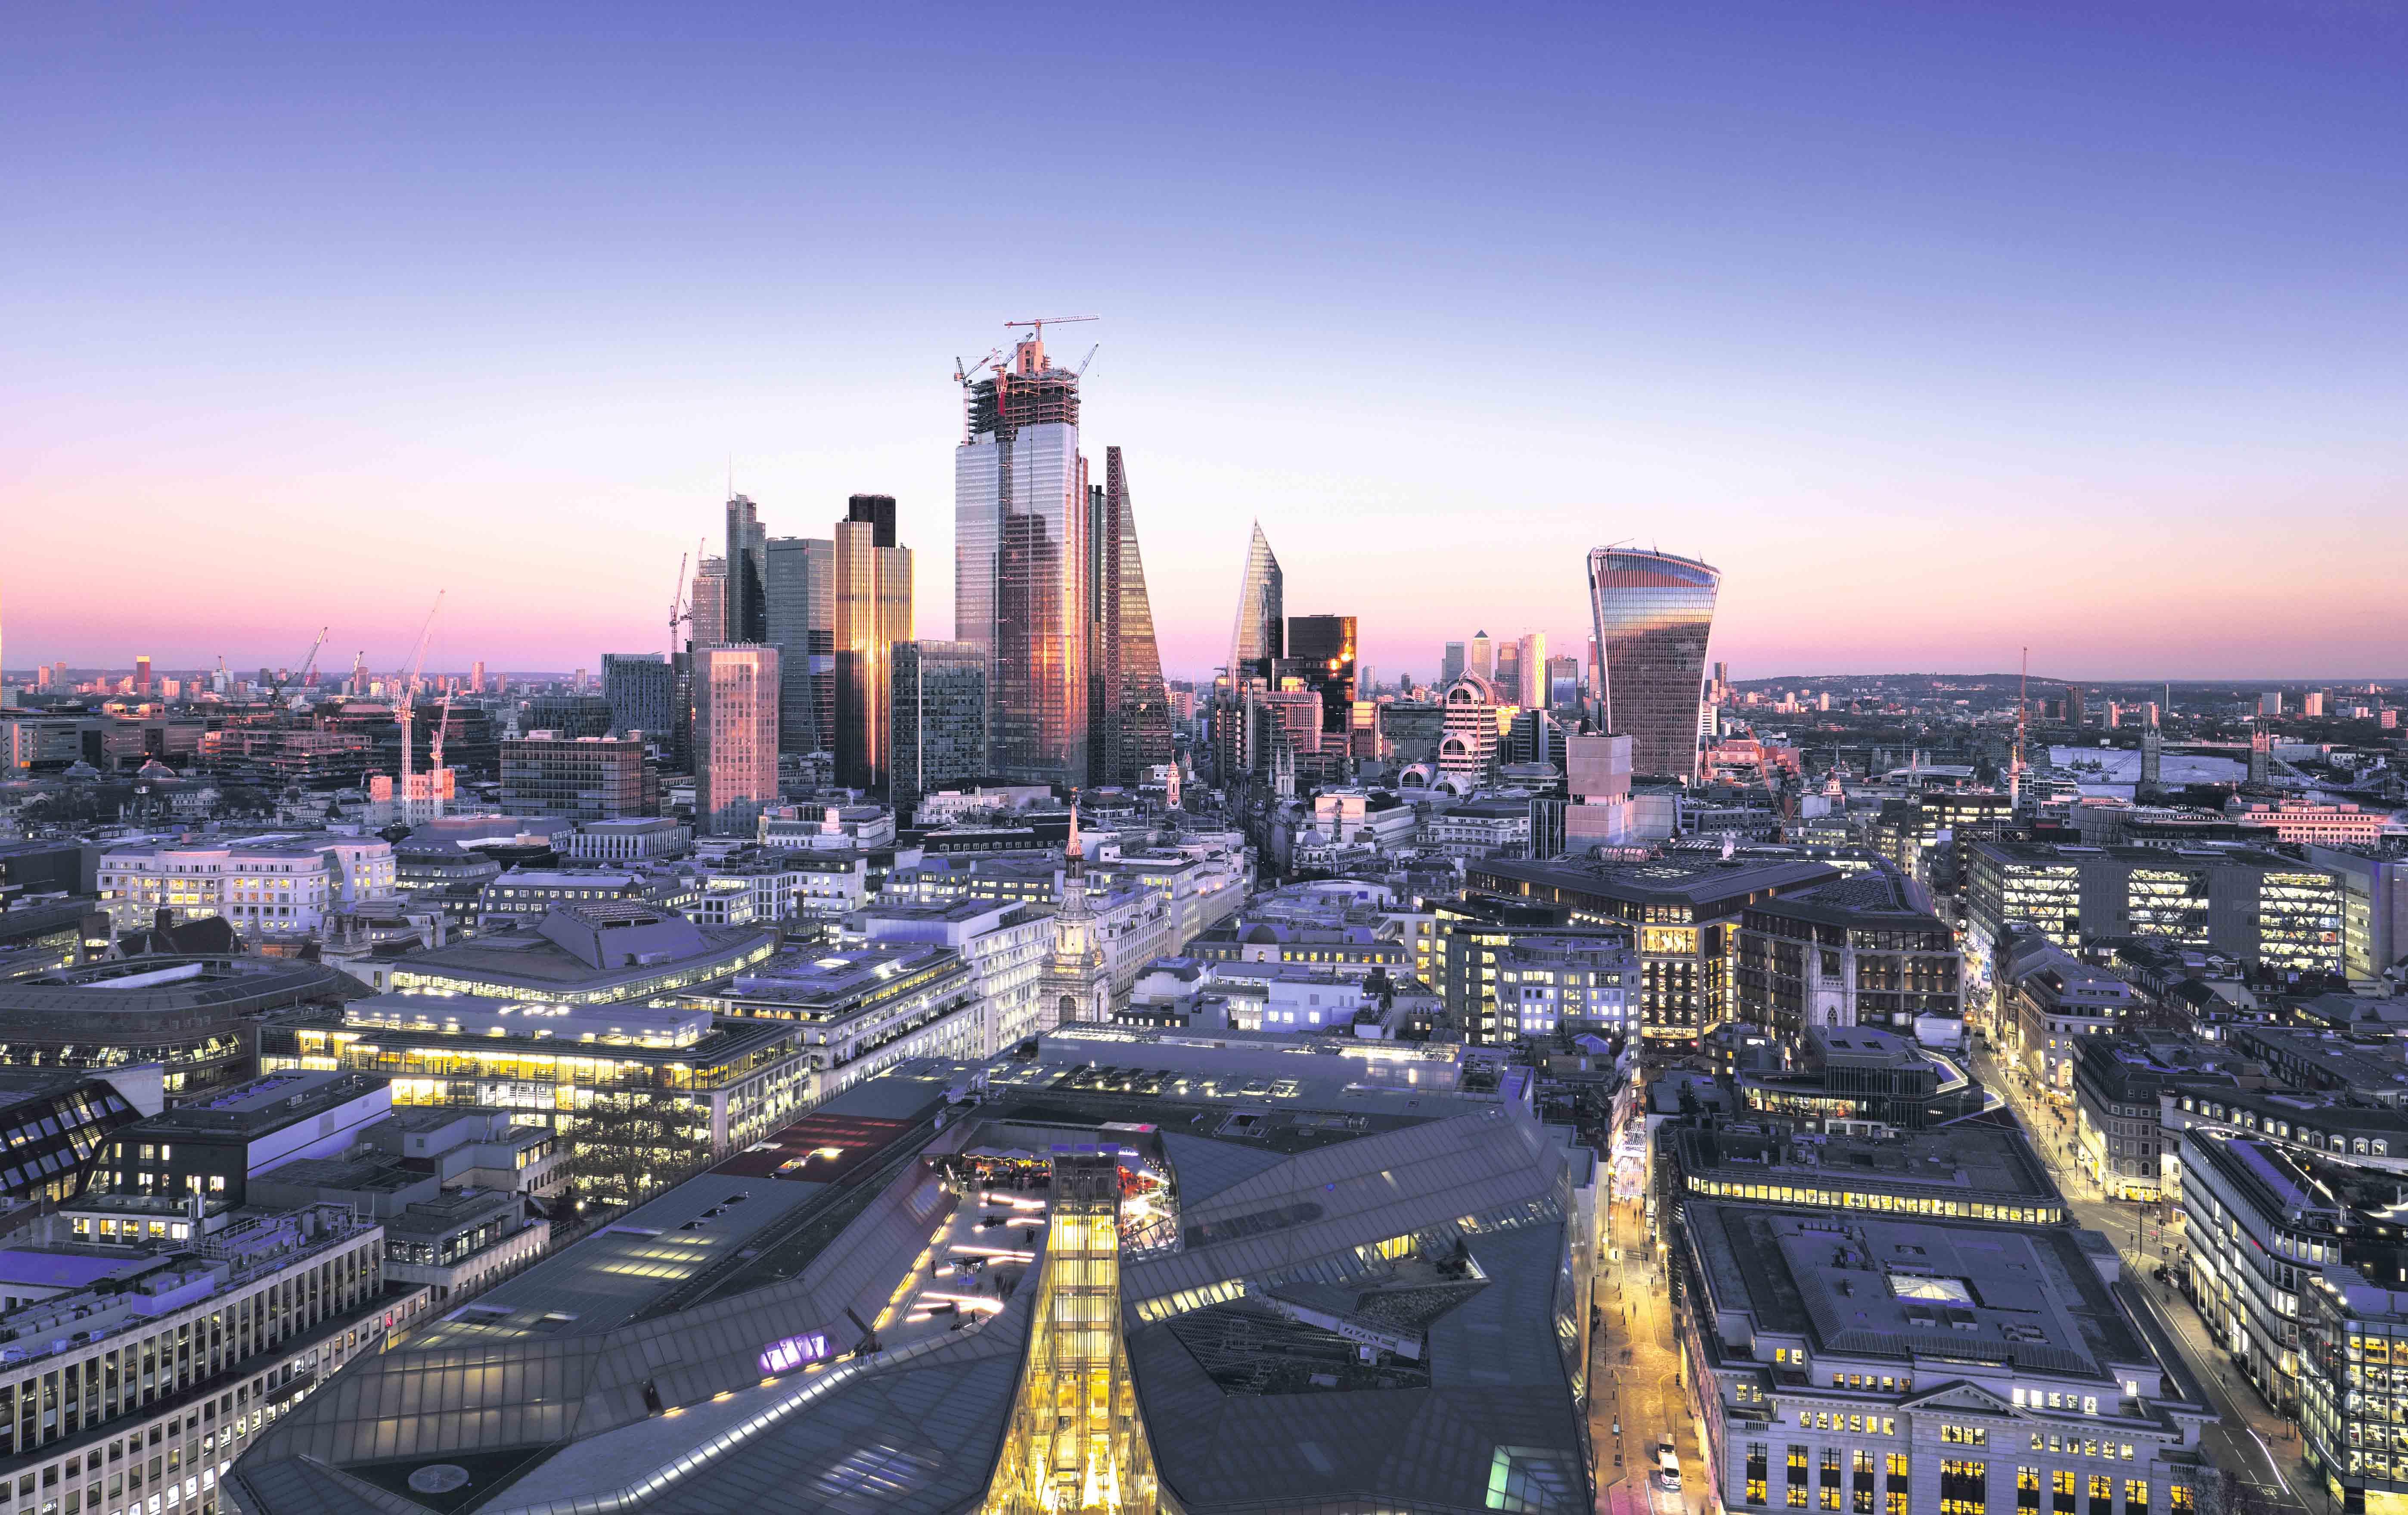 UK firms urged to review reward schemes